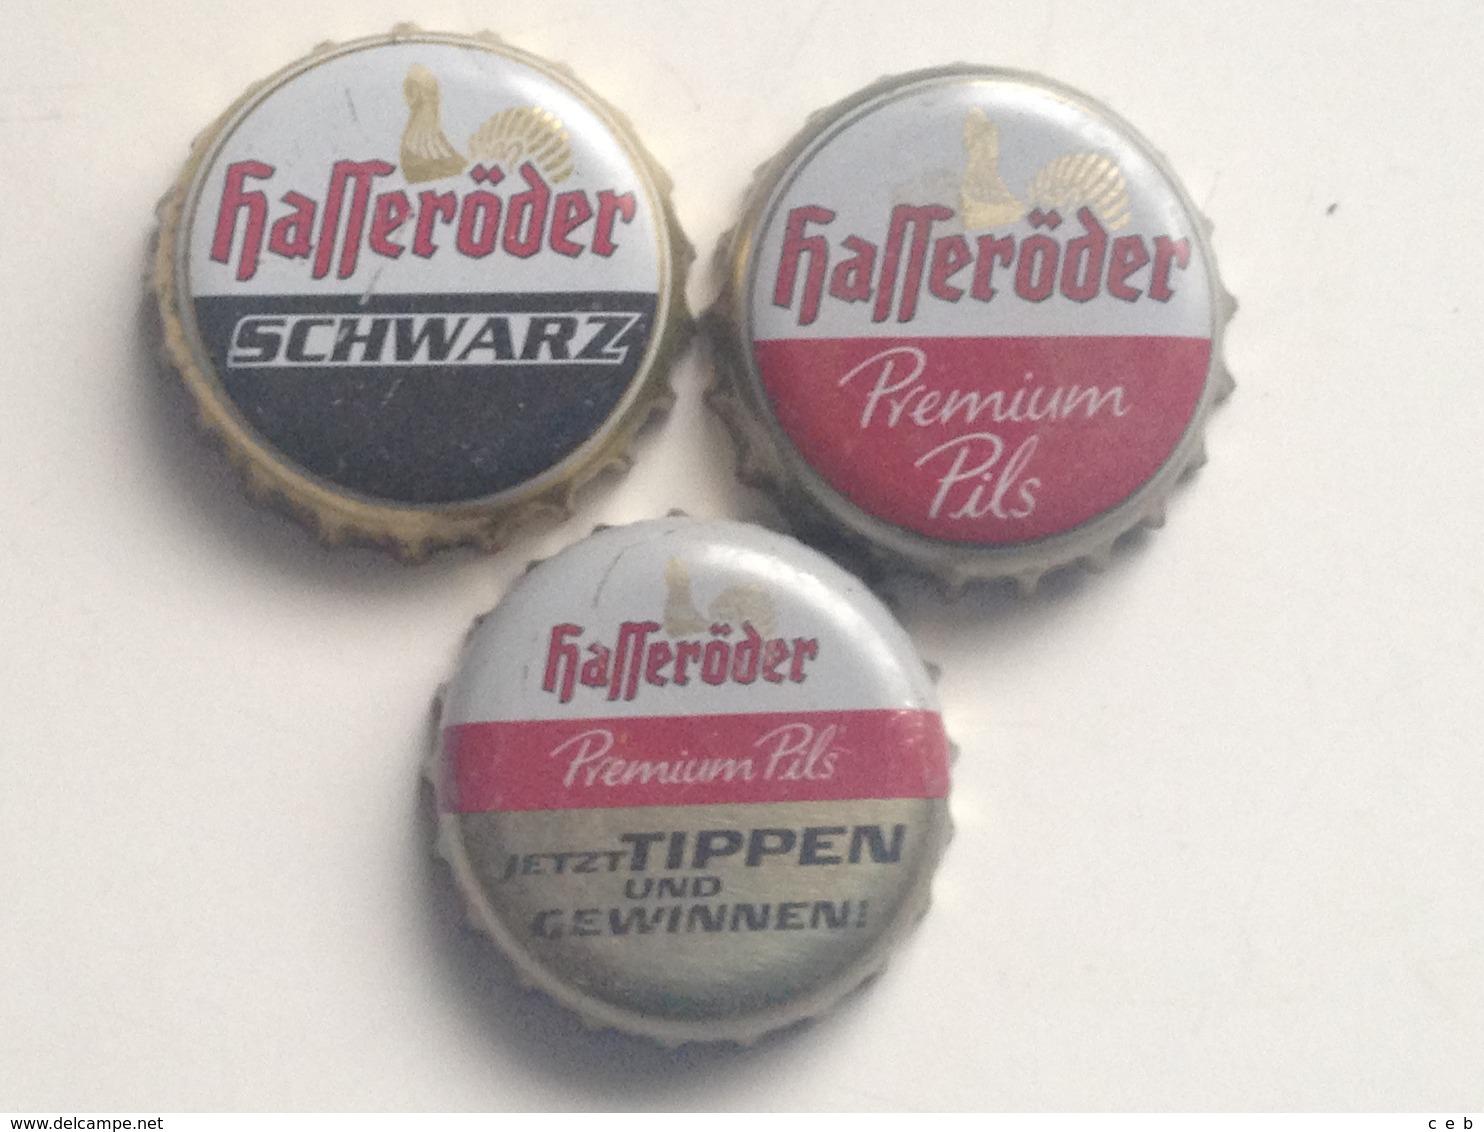 Lote 3 Chapas Kronkorken Caps Tappi Cerveza Hasseroder. Alemania - Birra